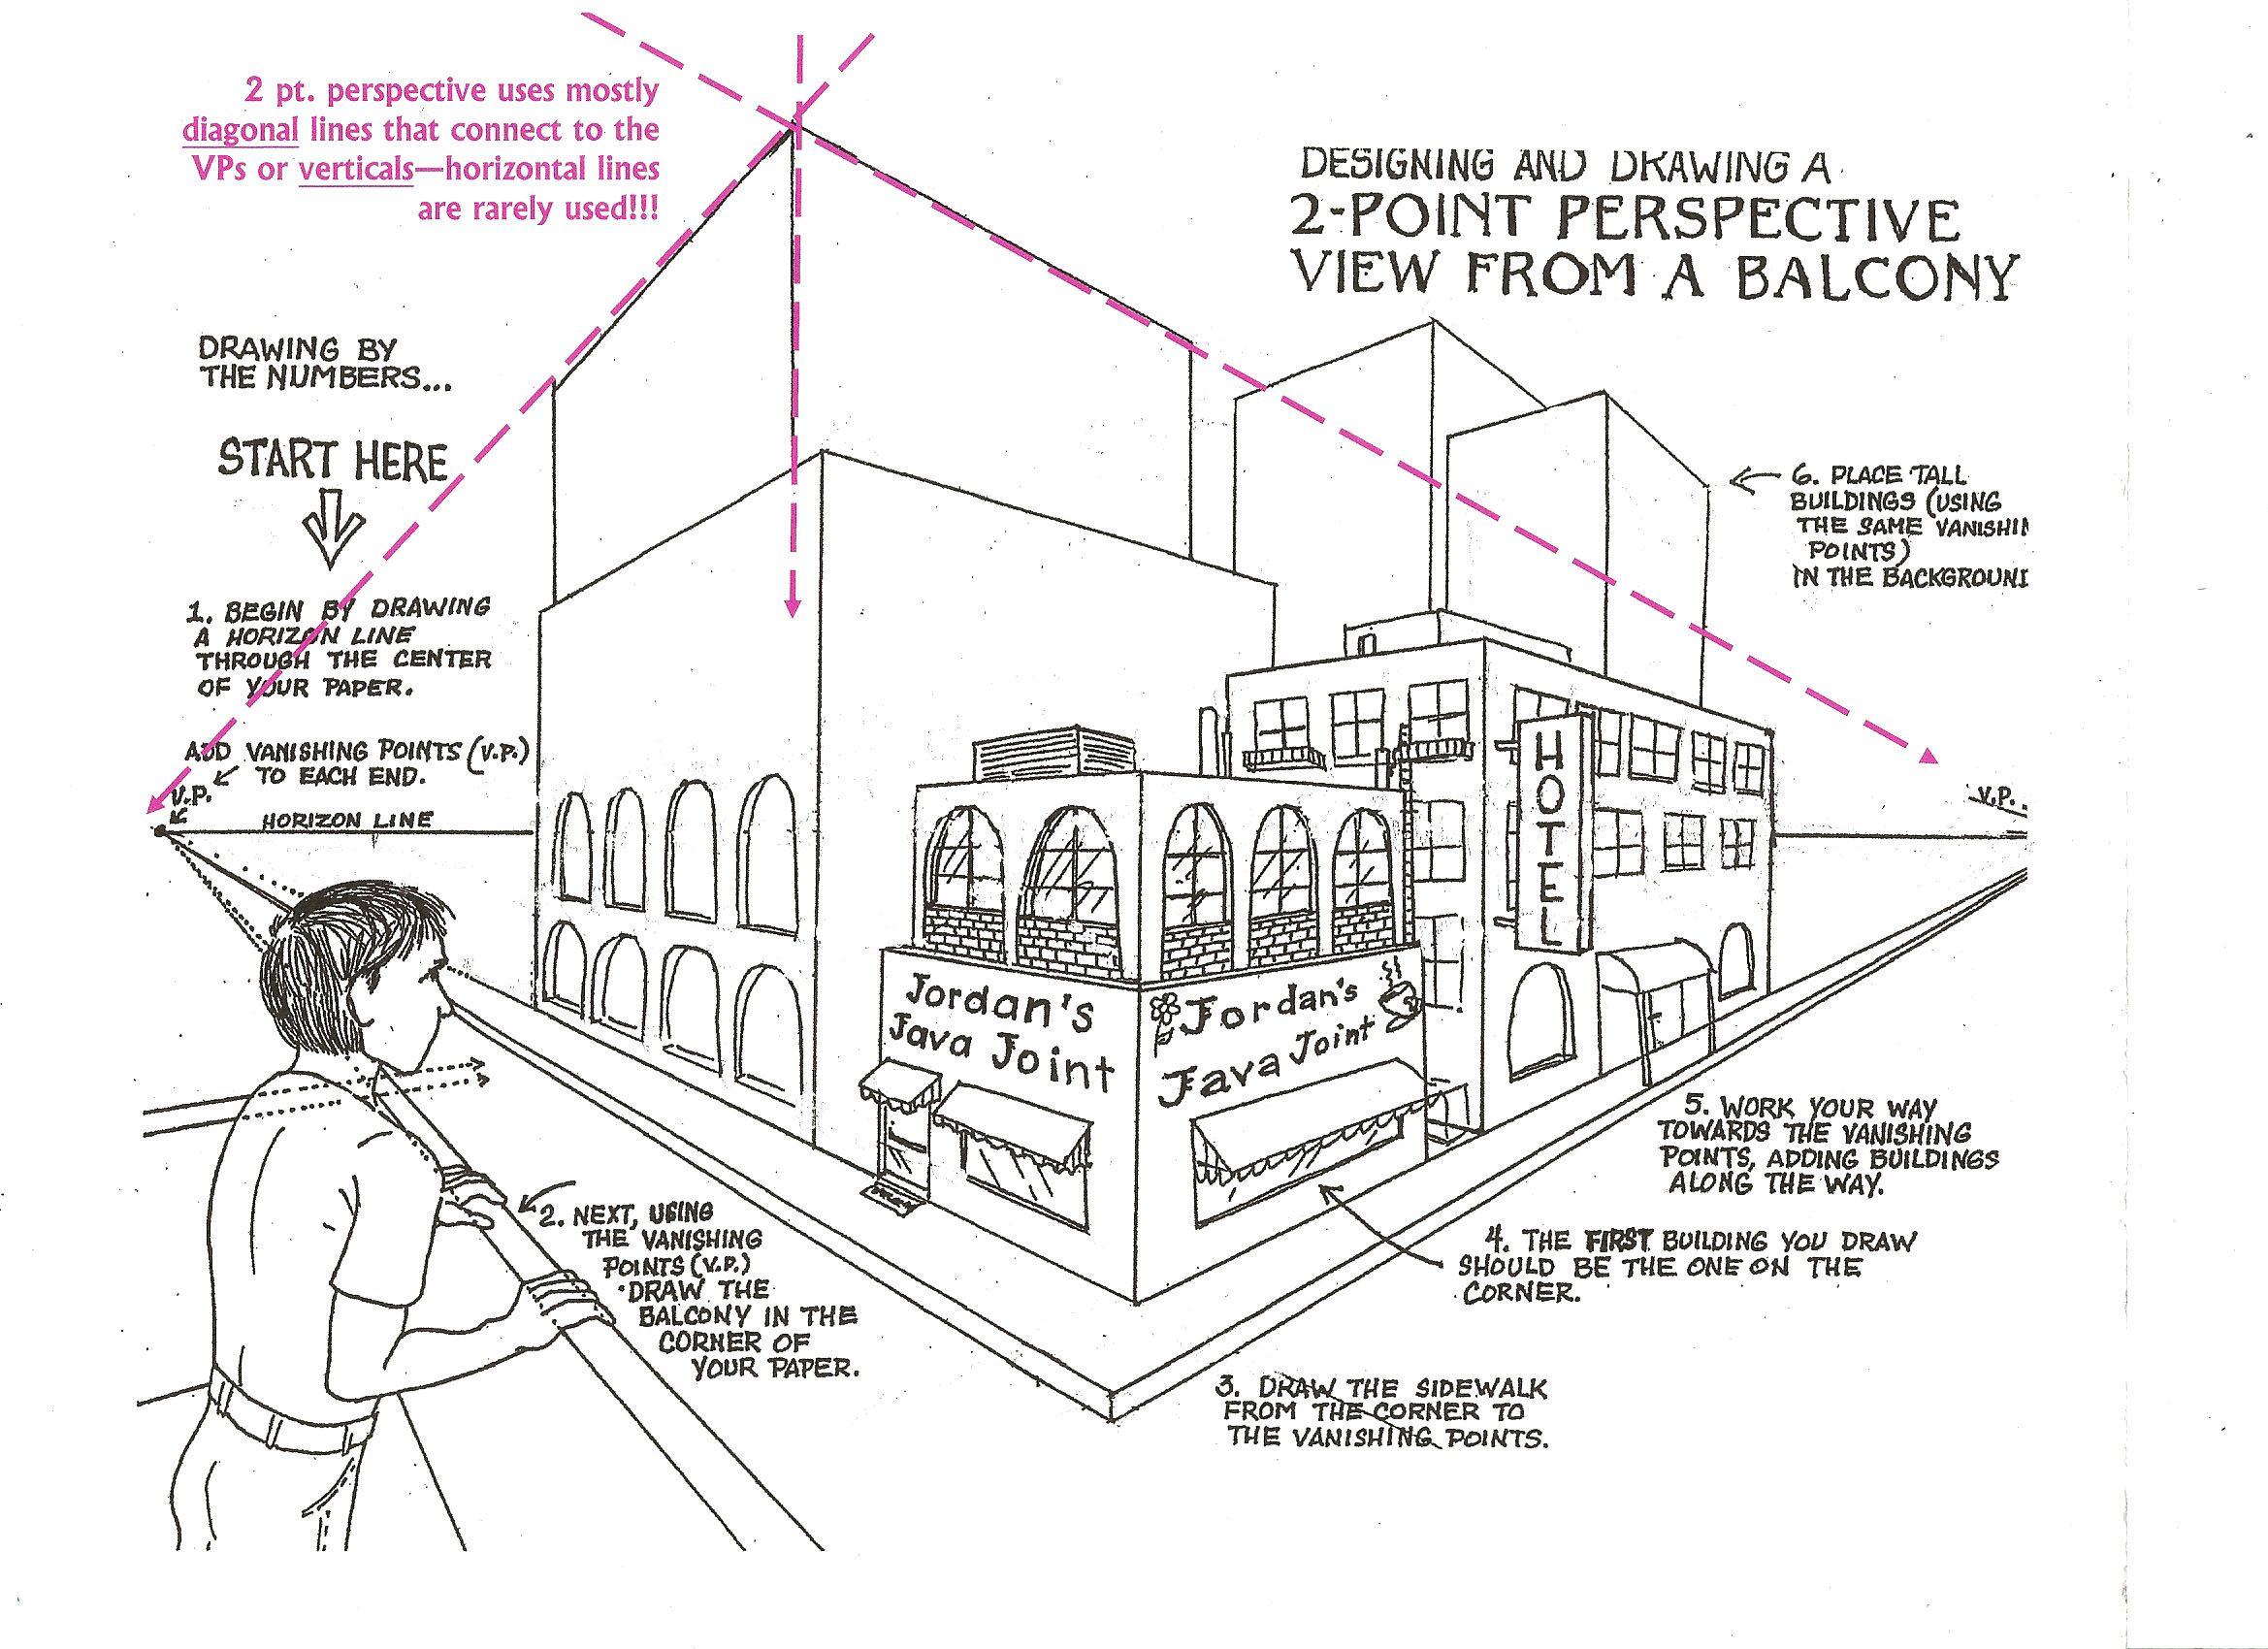 worksheet Perspective Worksheets pin by darla draws on space pinterest perspective 2pt perspective